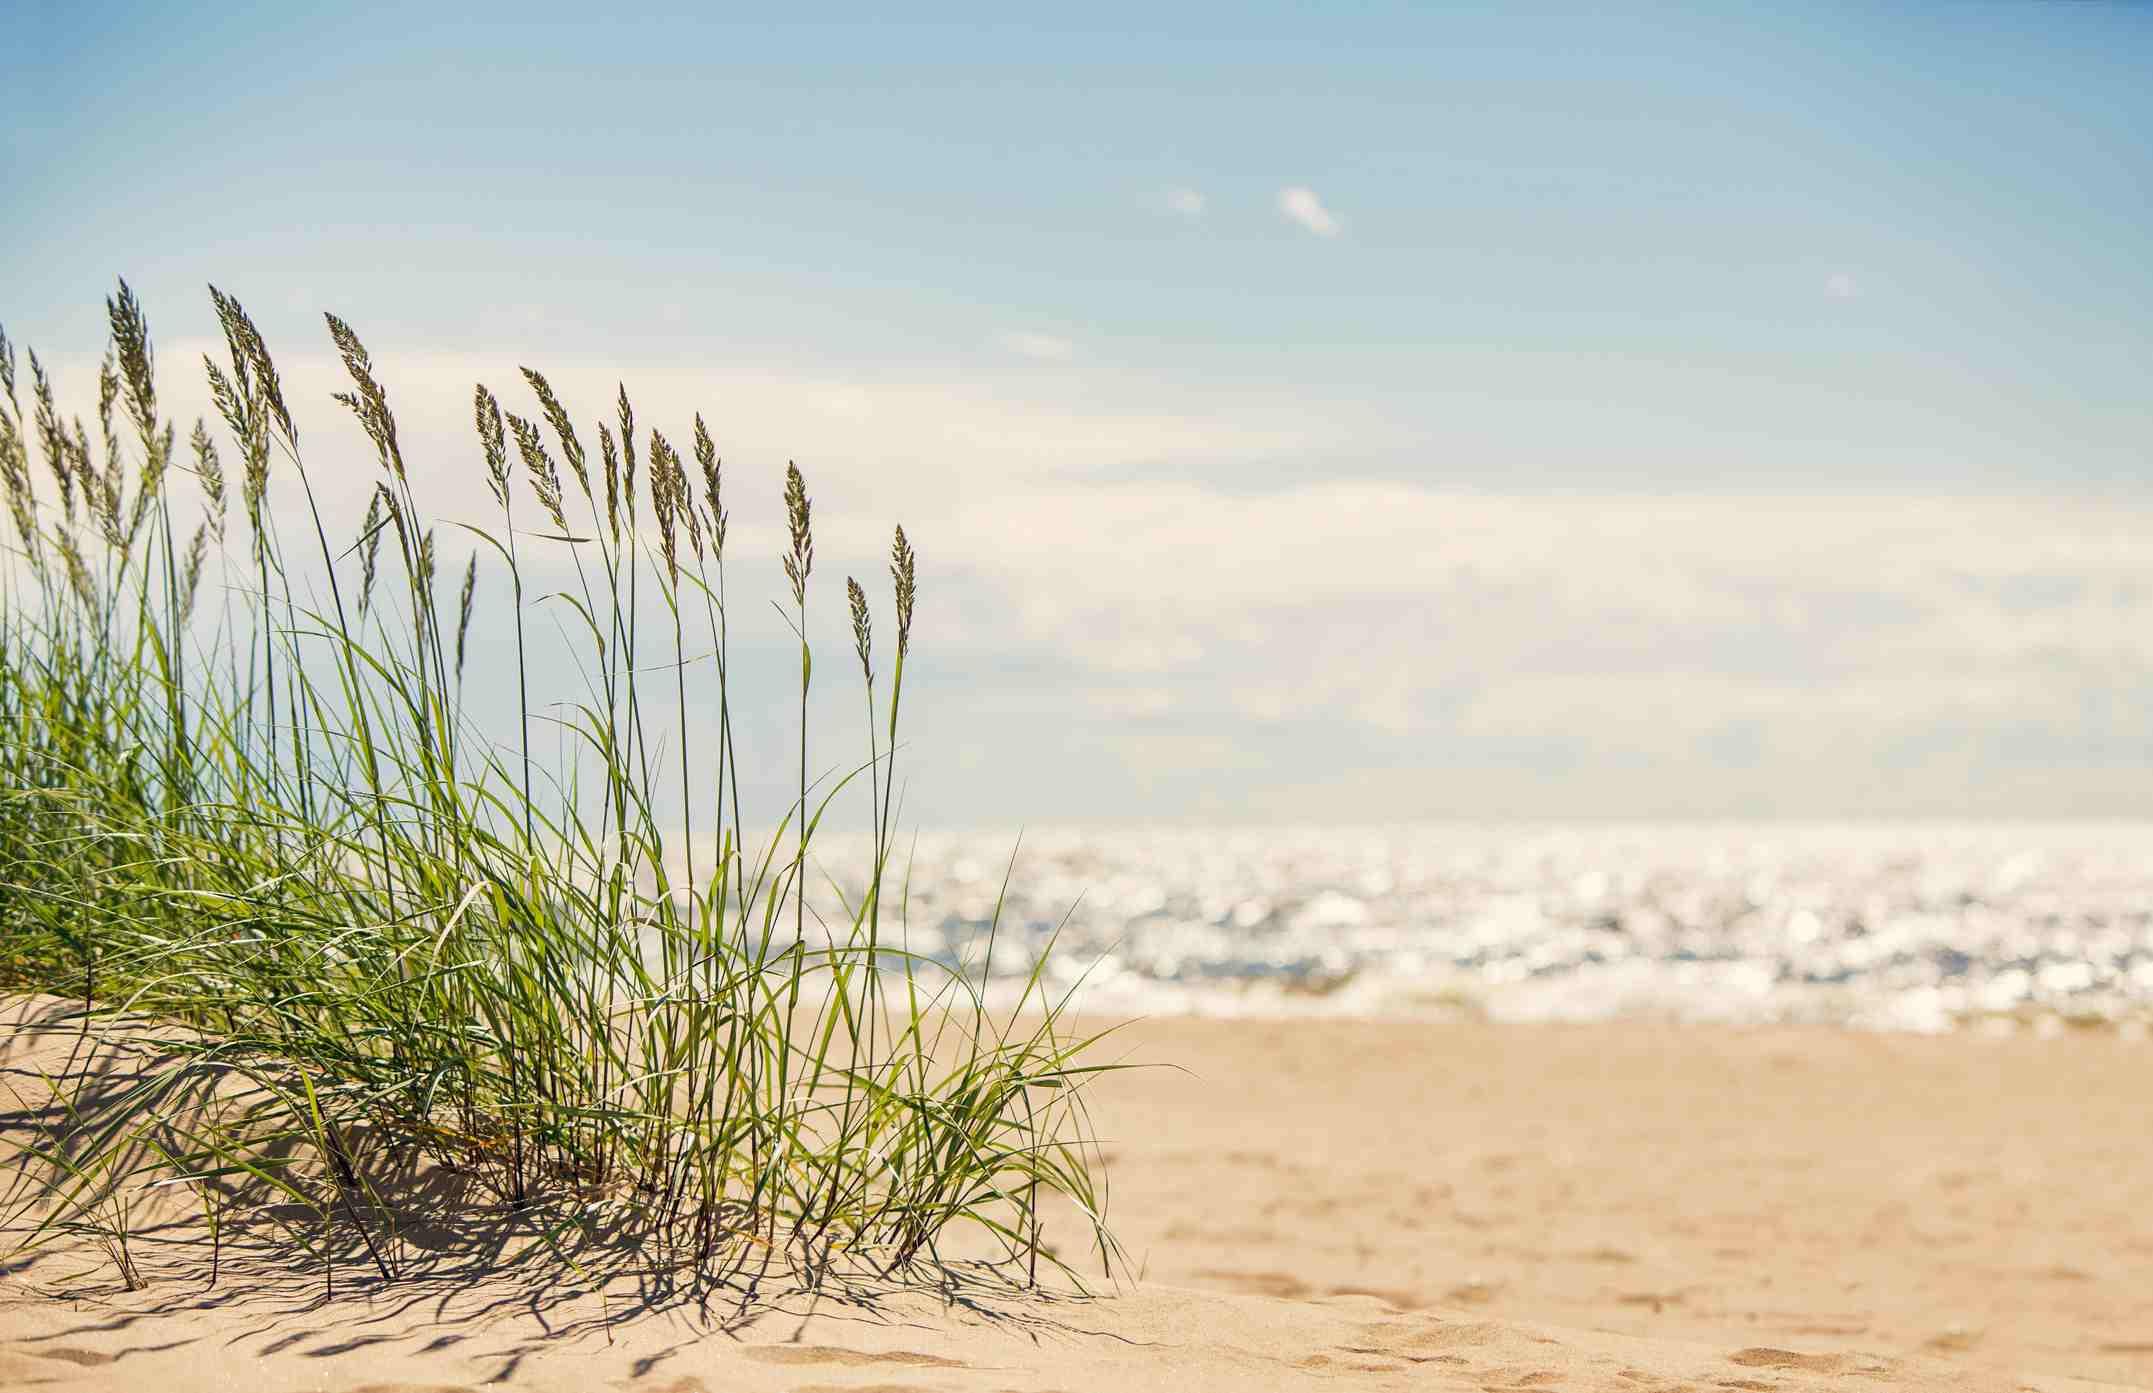 Sand dunes next to the beach